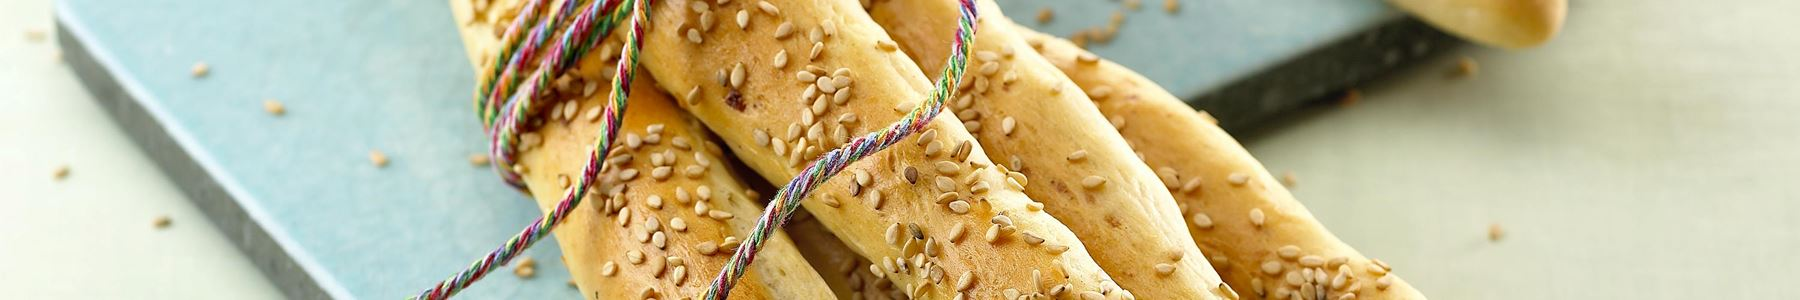 Brød + Tilbehør + Snacks og tapas